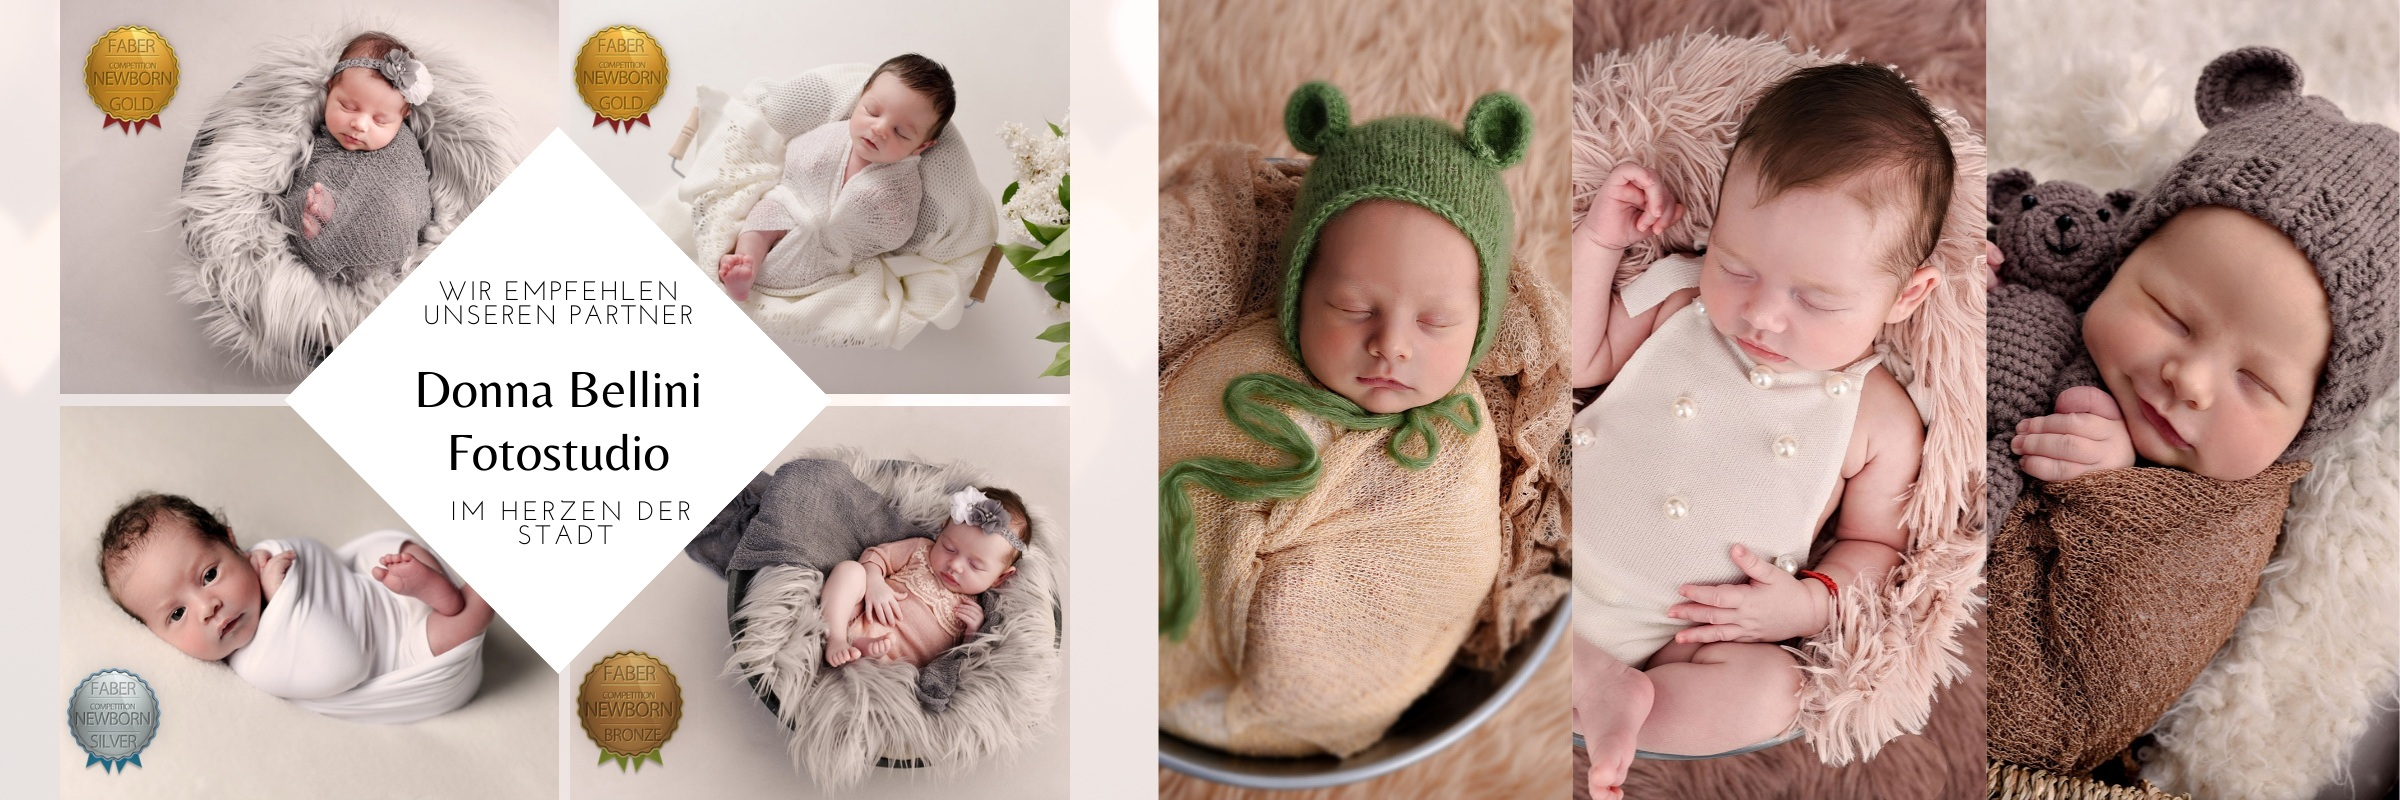 Preisgekrönte Neugeborenen Fotos